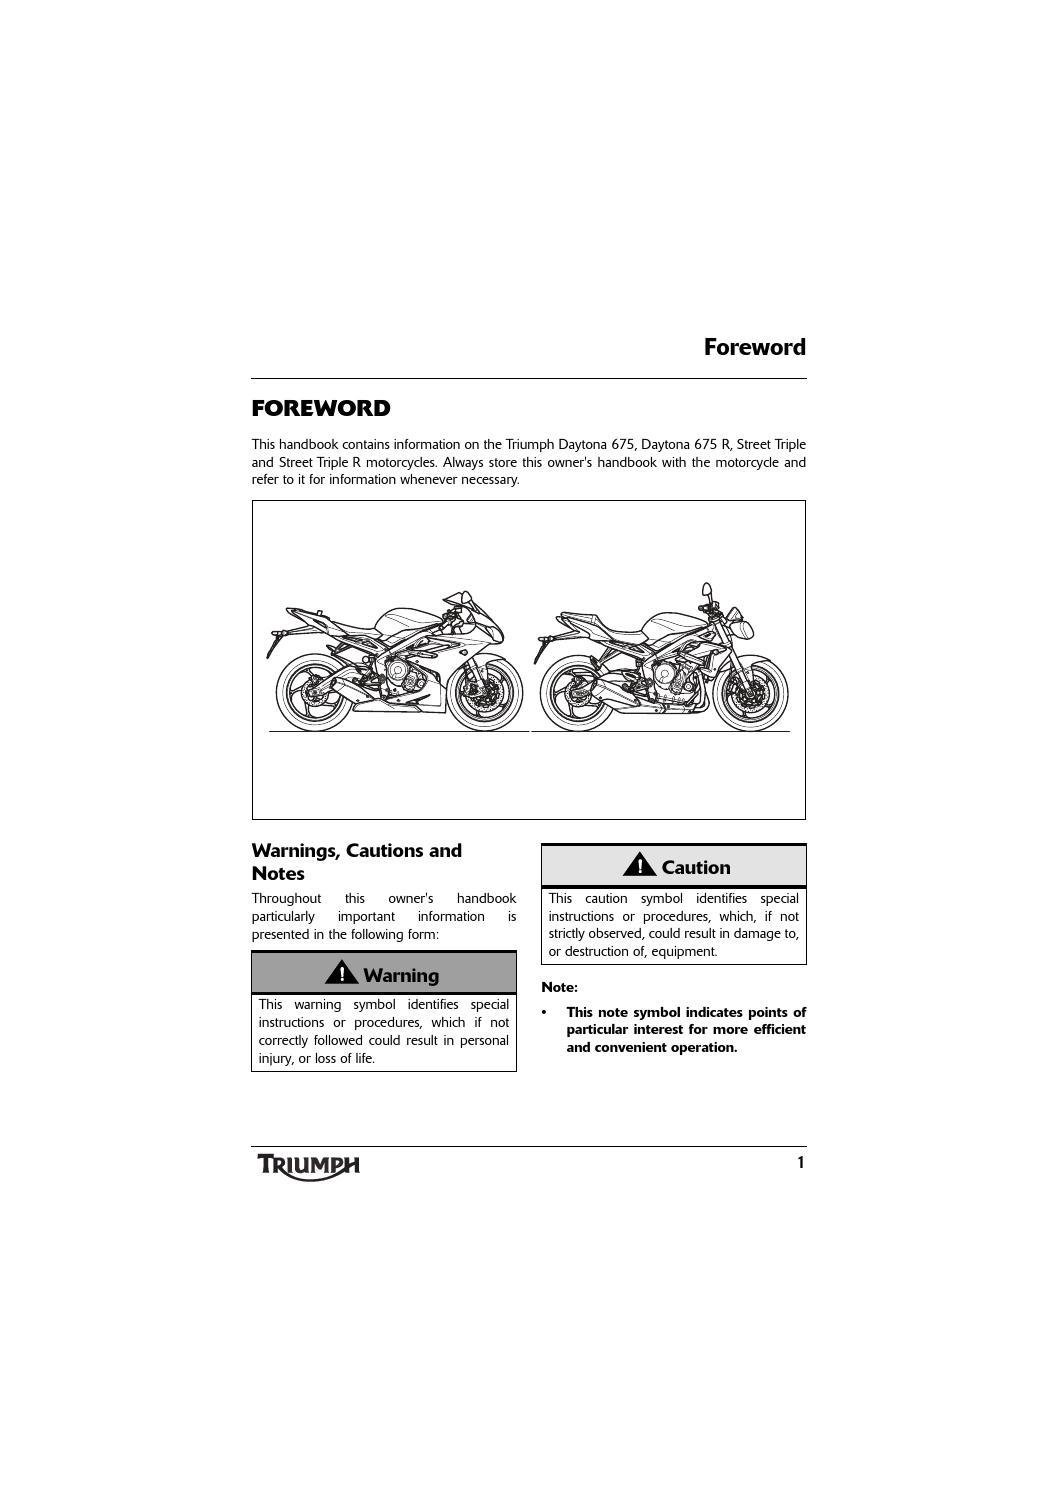 triumph street triple r wiring diagram 2016 club car precedent gas owner s manual abs by mototainment ducati new york issuu